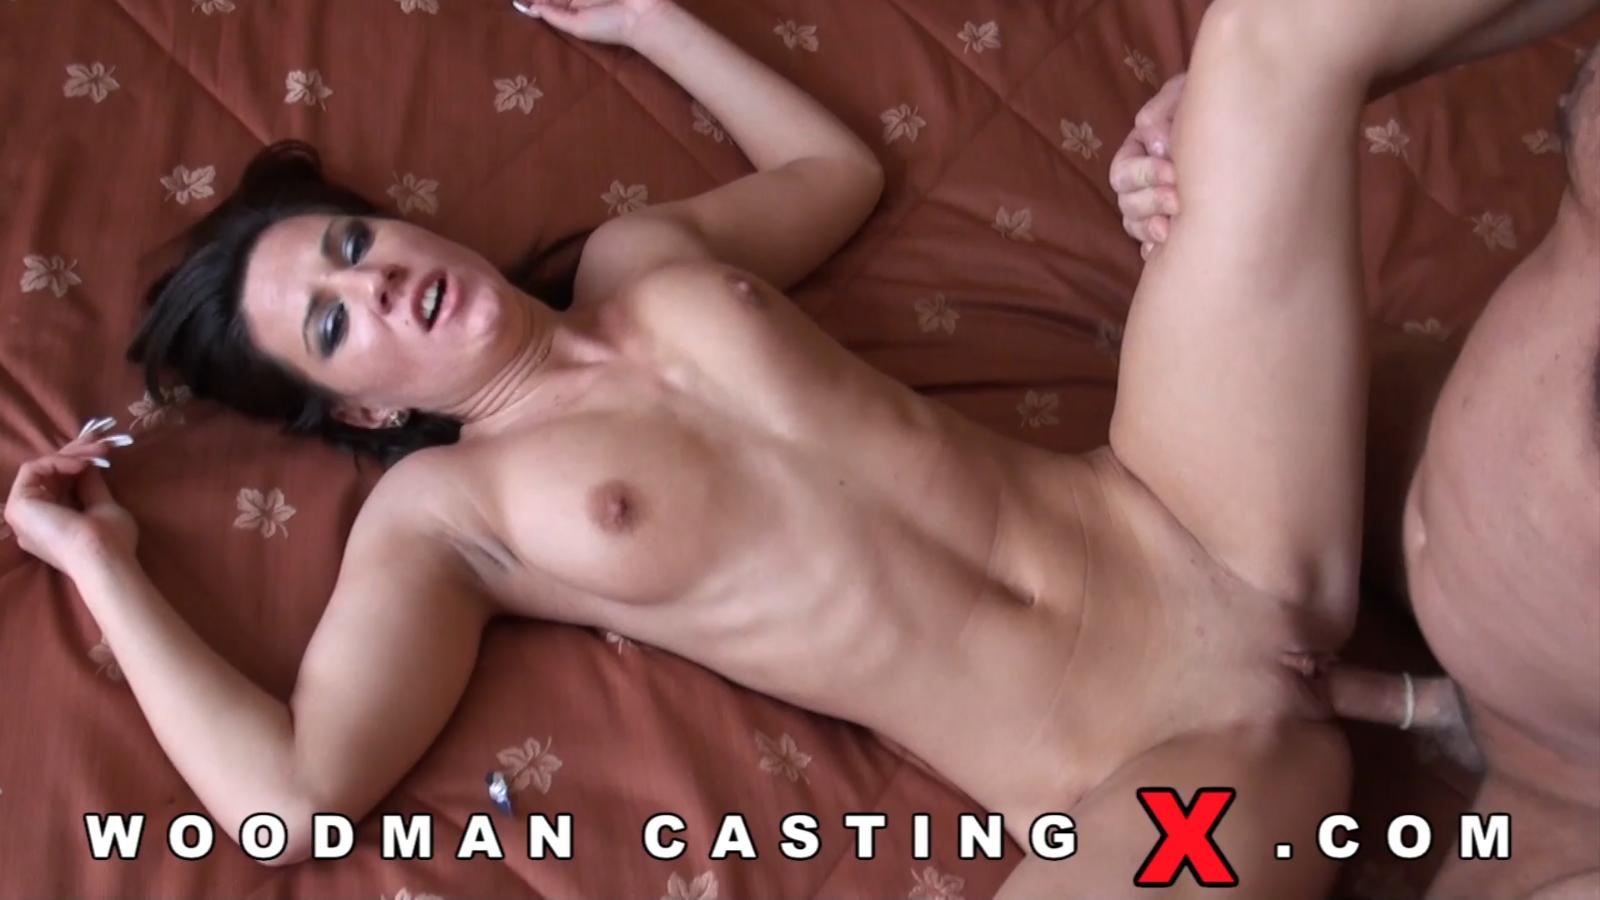 Casting X Woodman